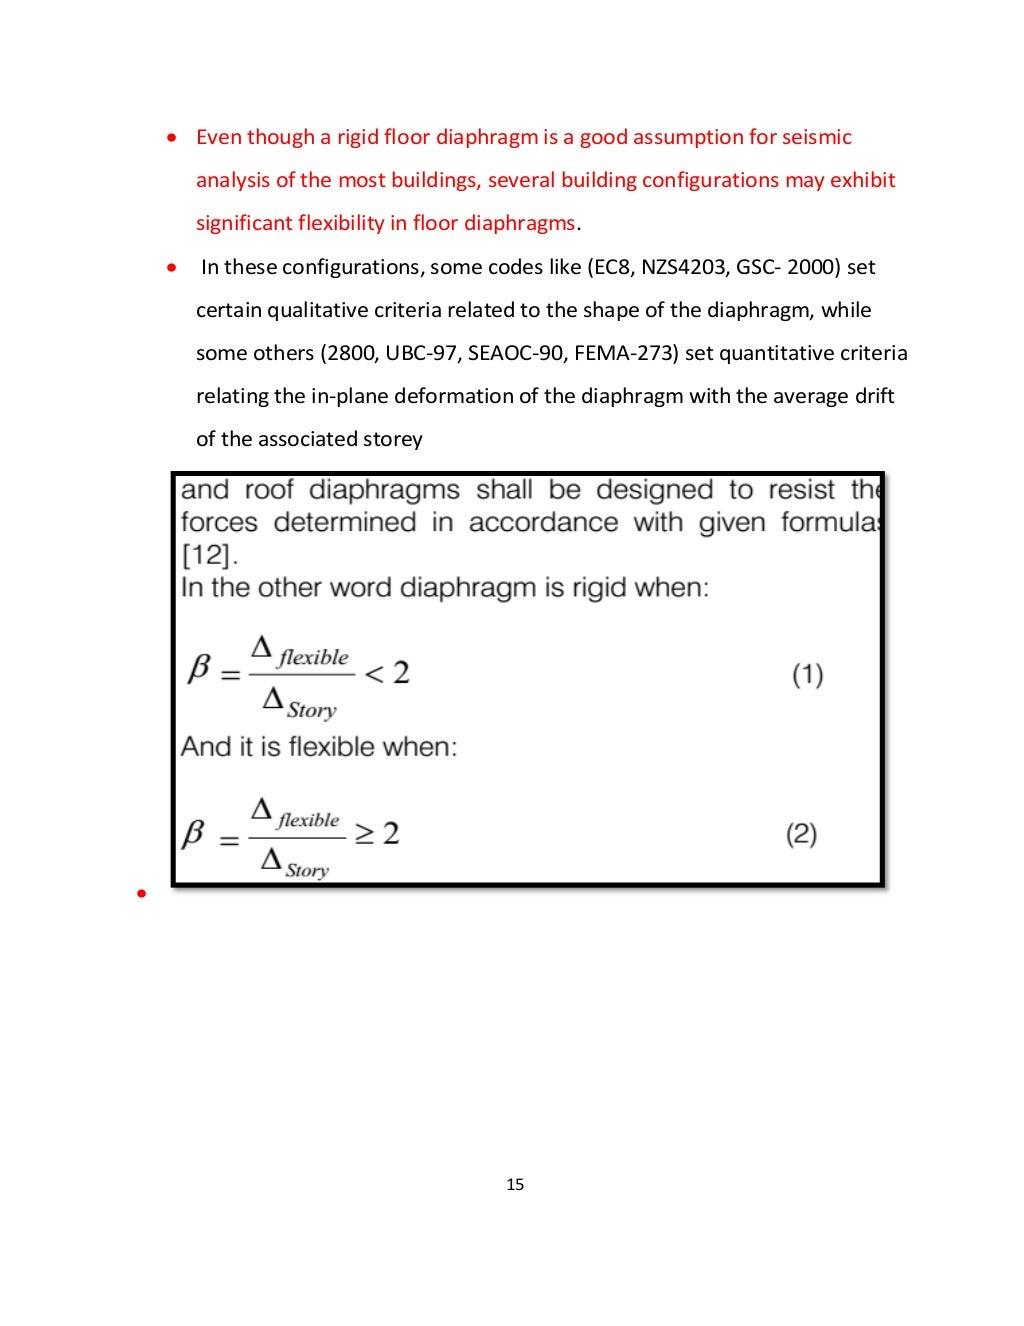 rigid-semi-rigid-flexible-diaphragm-for-seismic-analysis-15-1024.jpg